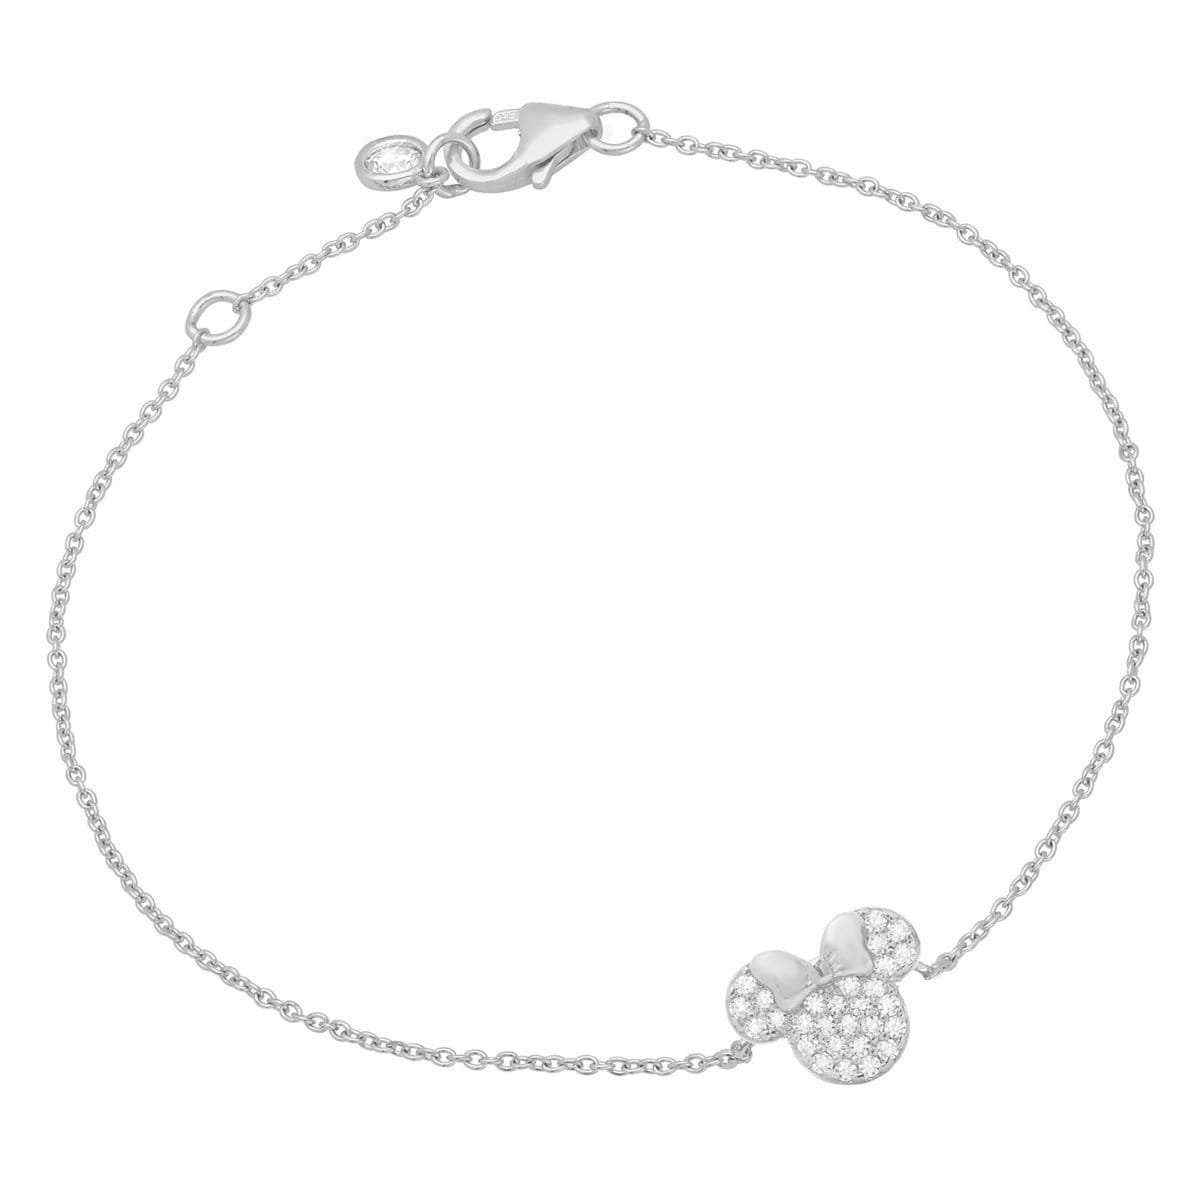 ae9eabe0c Product Image of Minnie Mouse Icon Bracelet by CRISLU - Platinum # 1